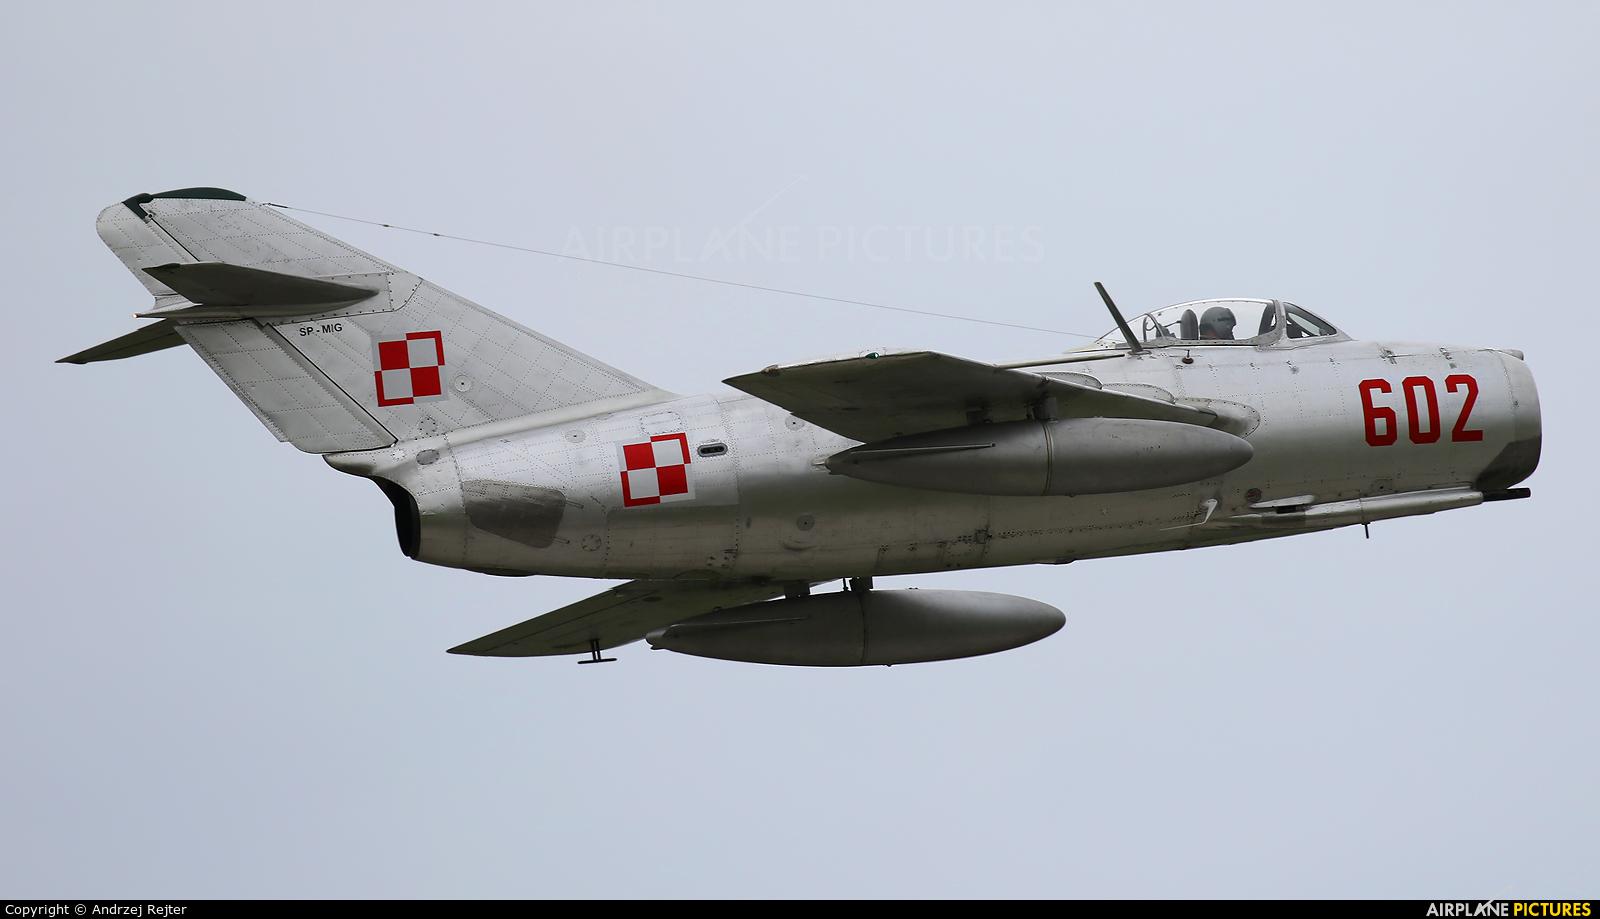 Private SP-MIG aircraft at Gdynia- Babie Doły (Oksywie)